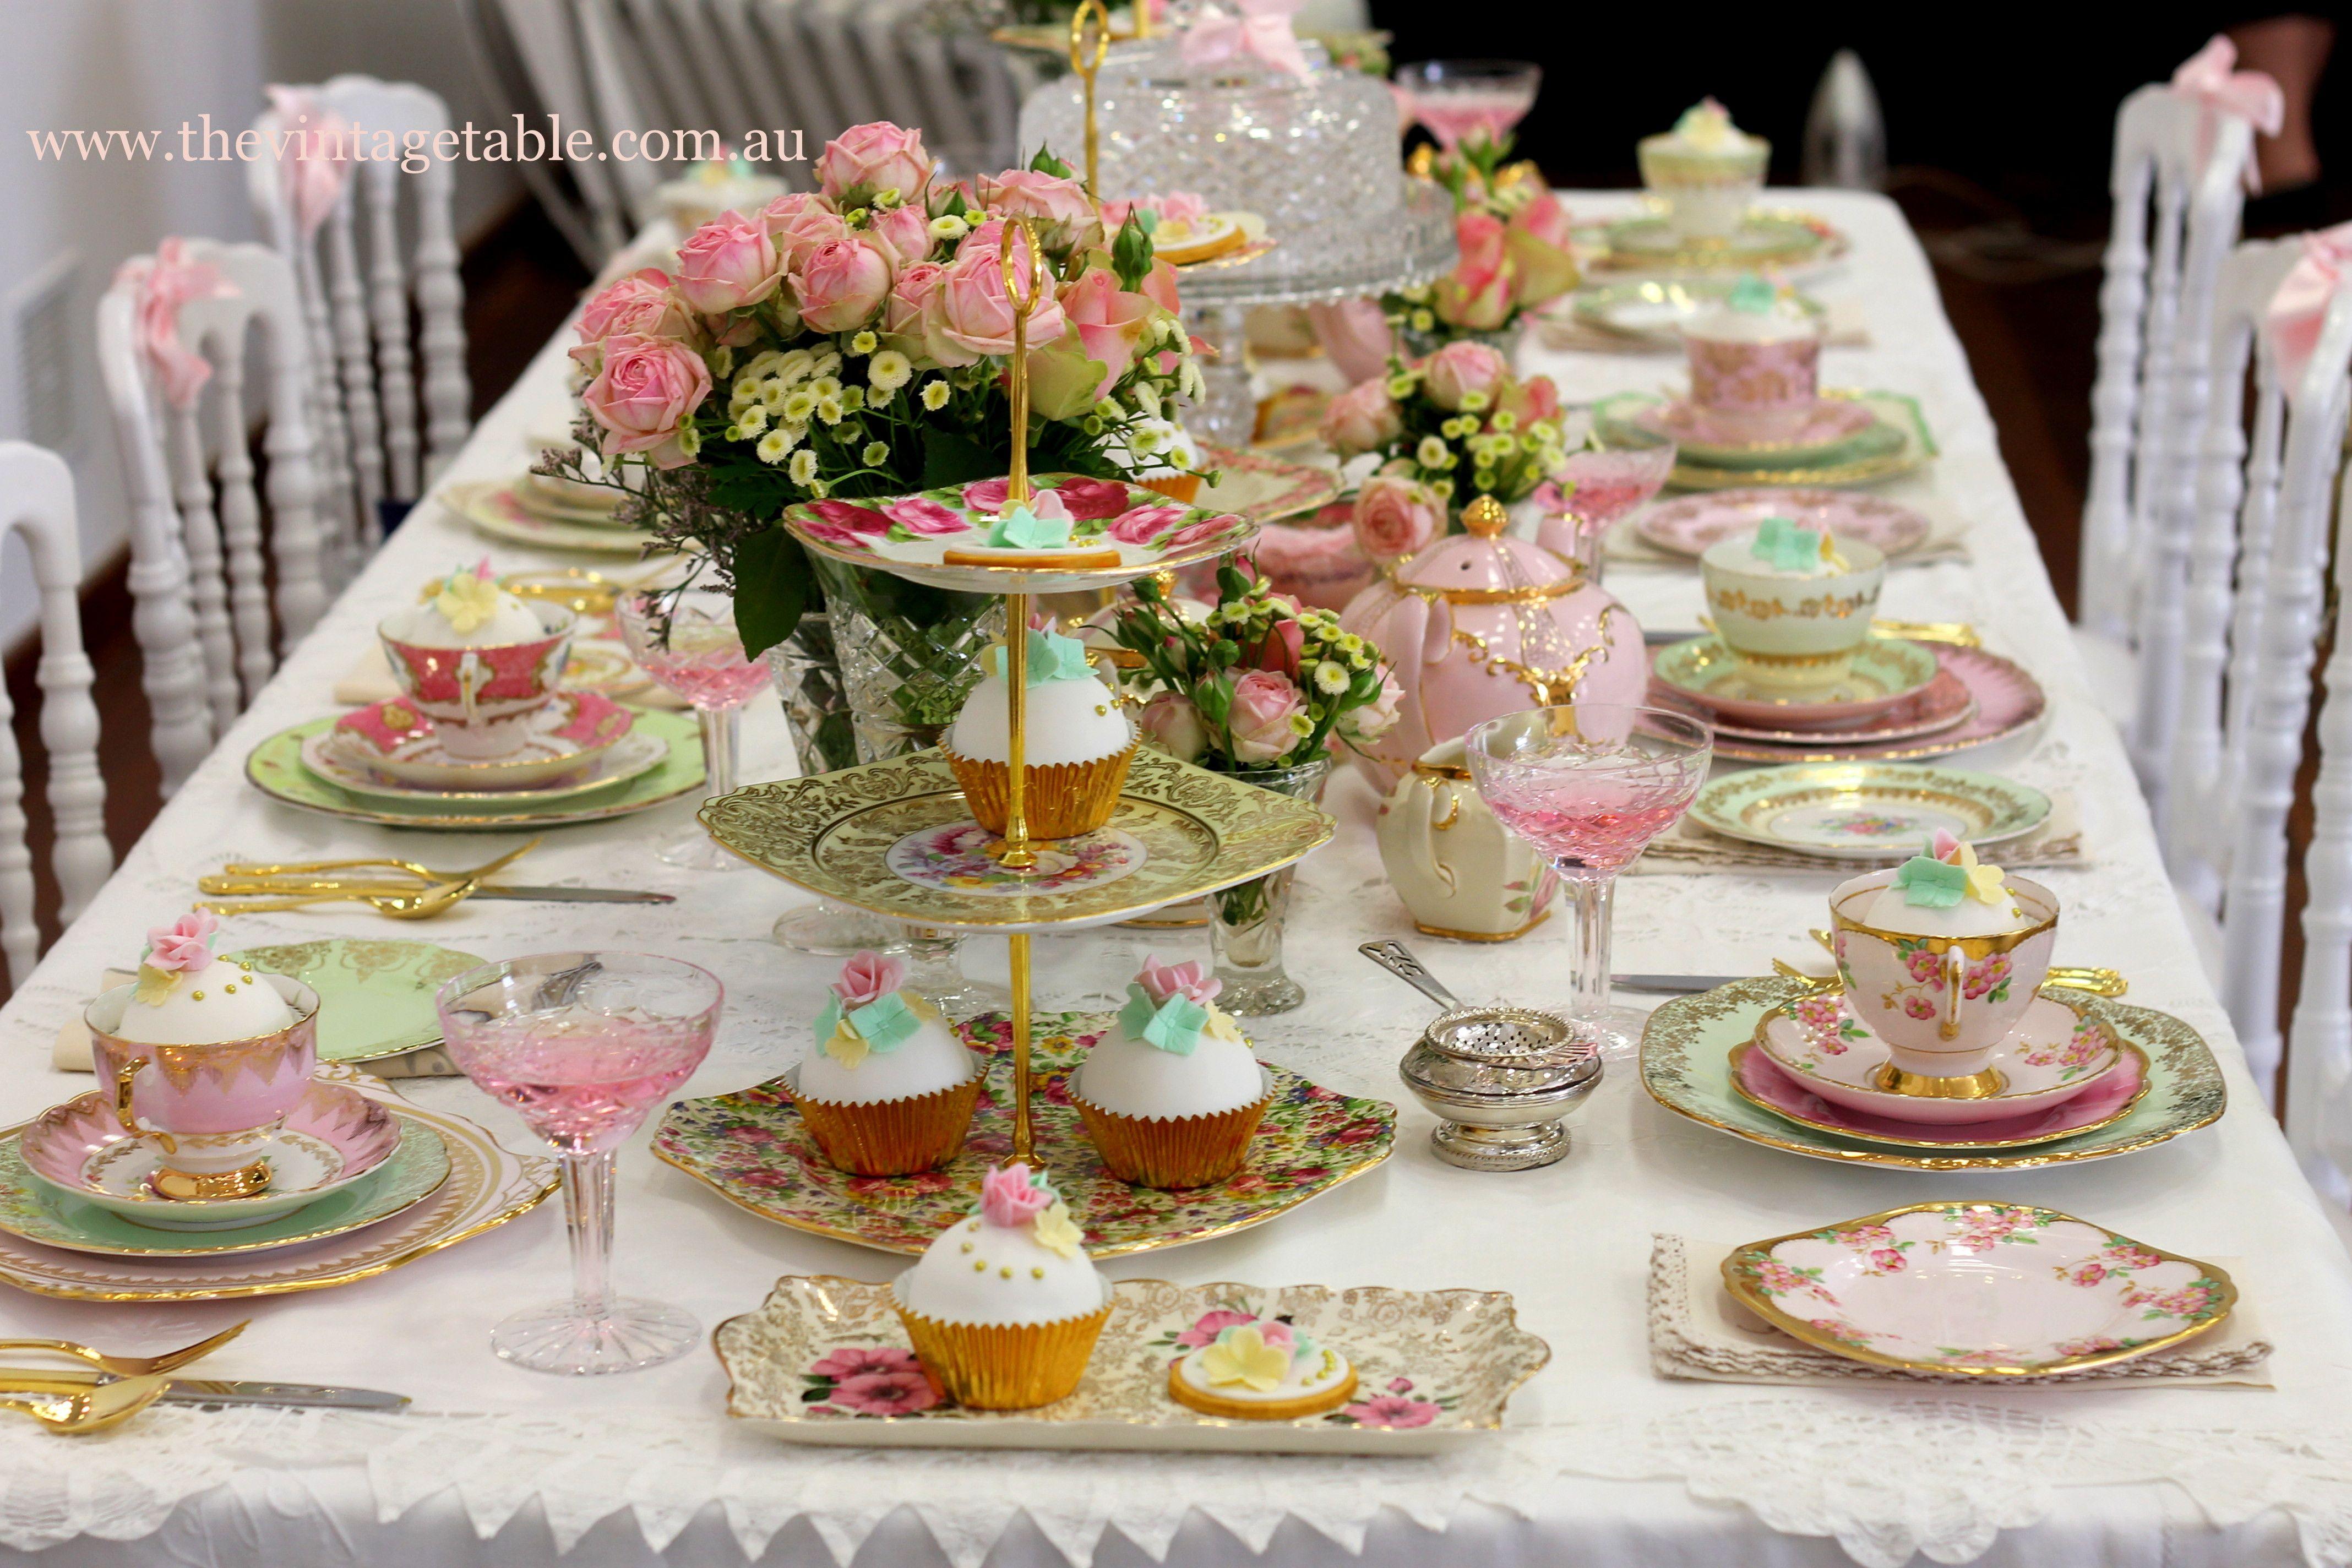 Vintage High Tea Bridal Shower Party